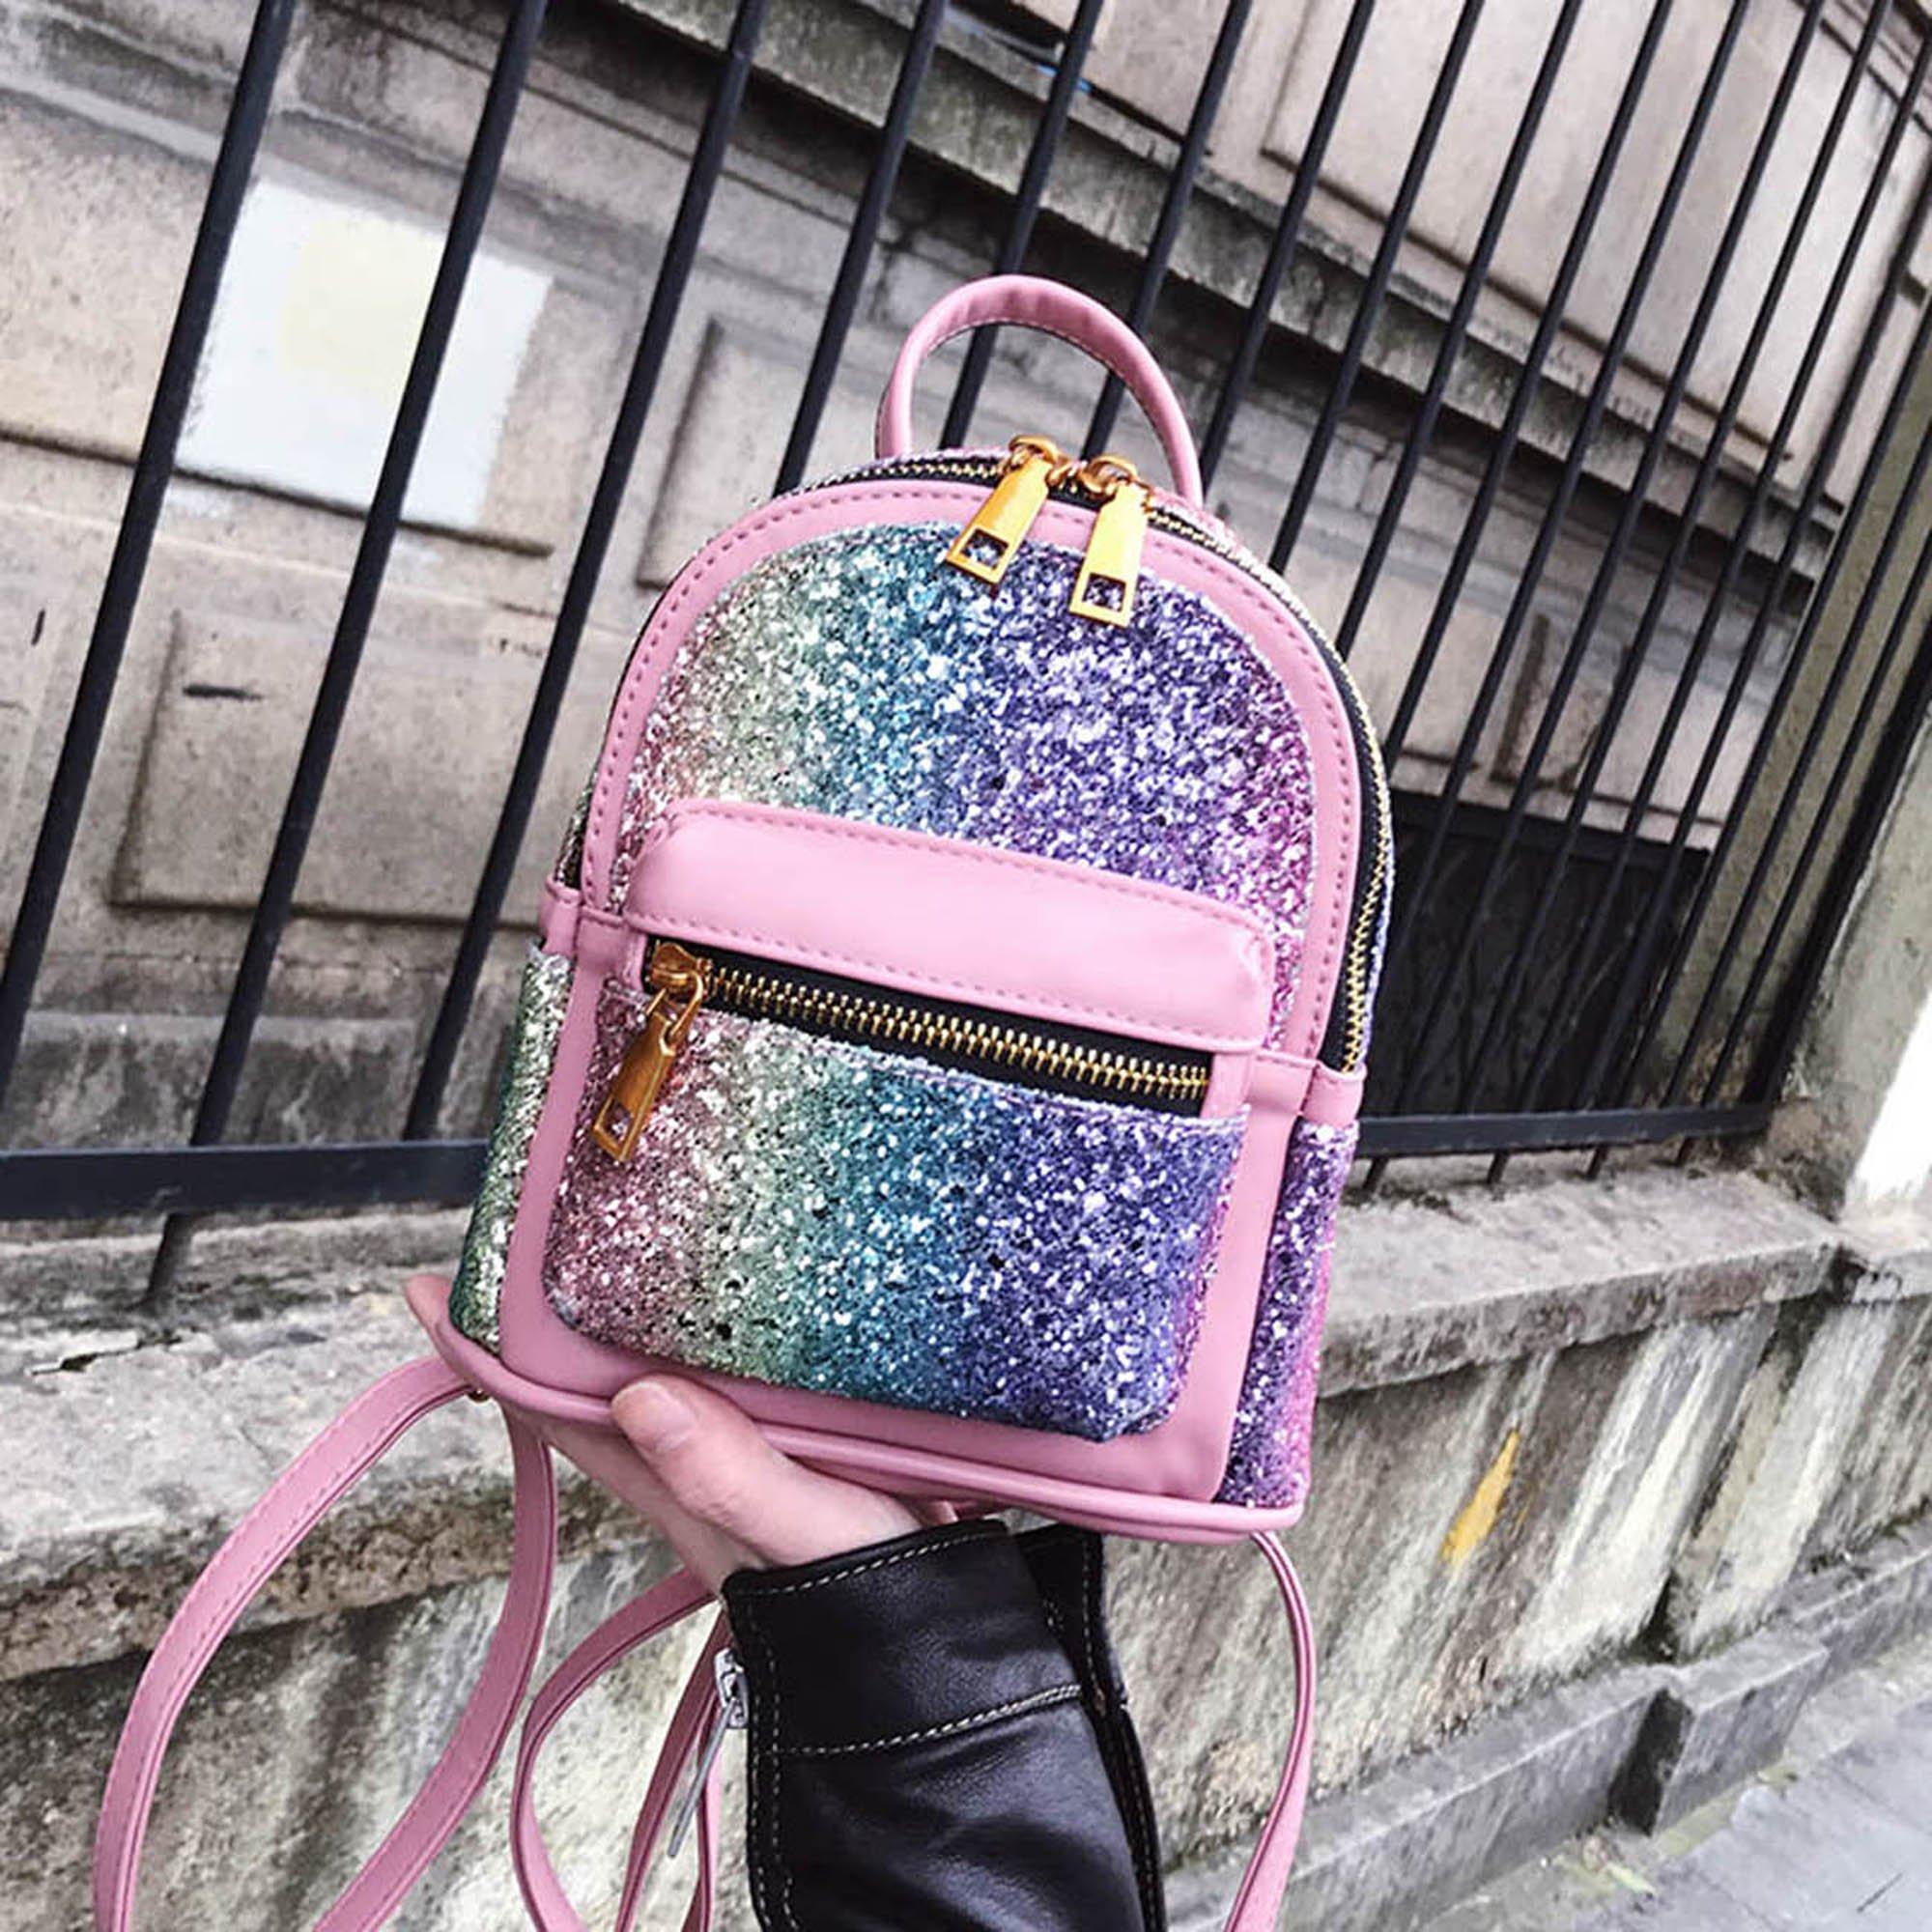 Girls Bling Mini Travel Backpack Kids Children School Bags Satchel Purses Daypack (pink rainbow) by JIANBAO (Image #7)